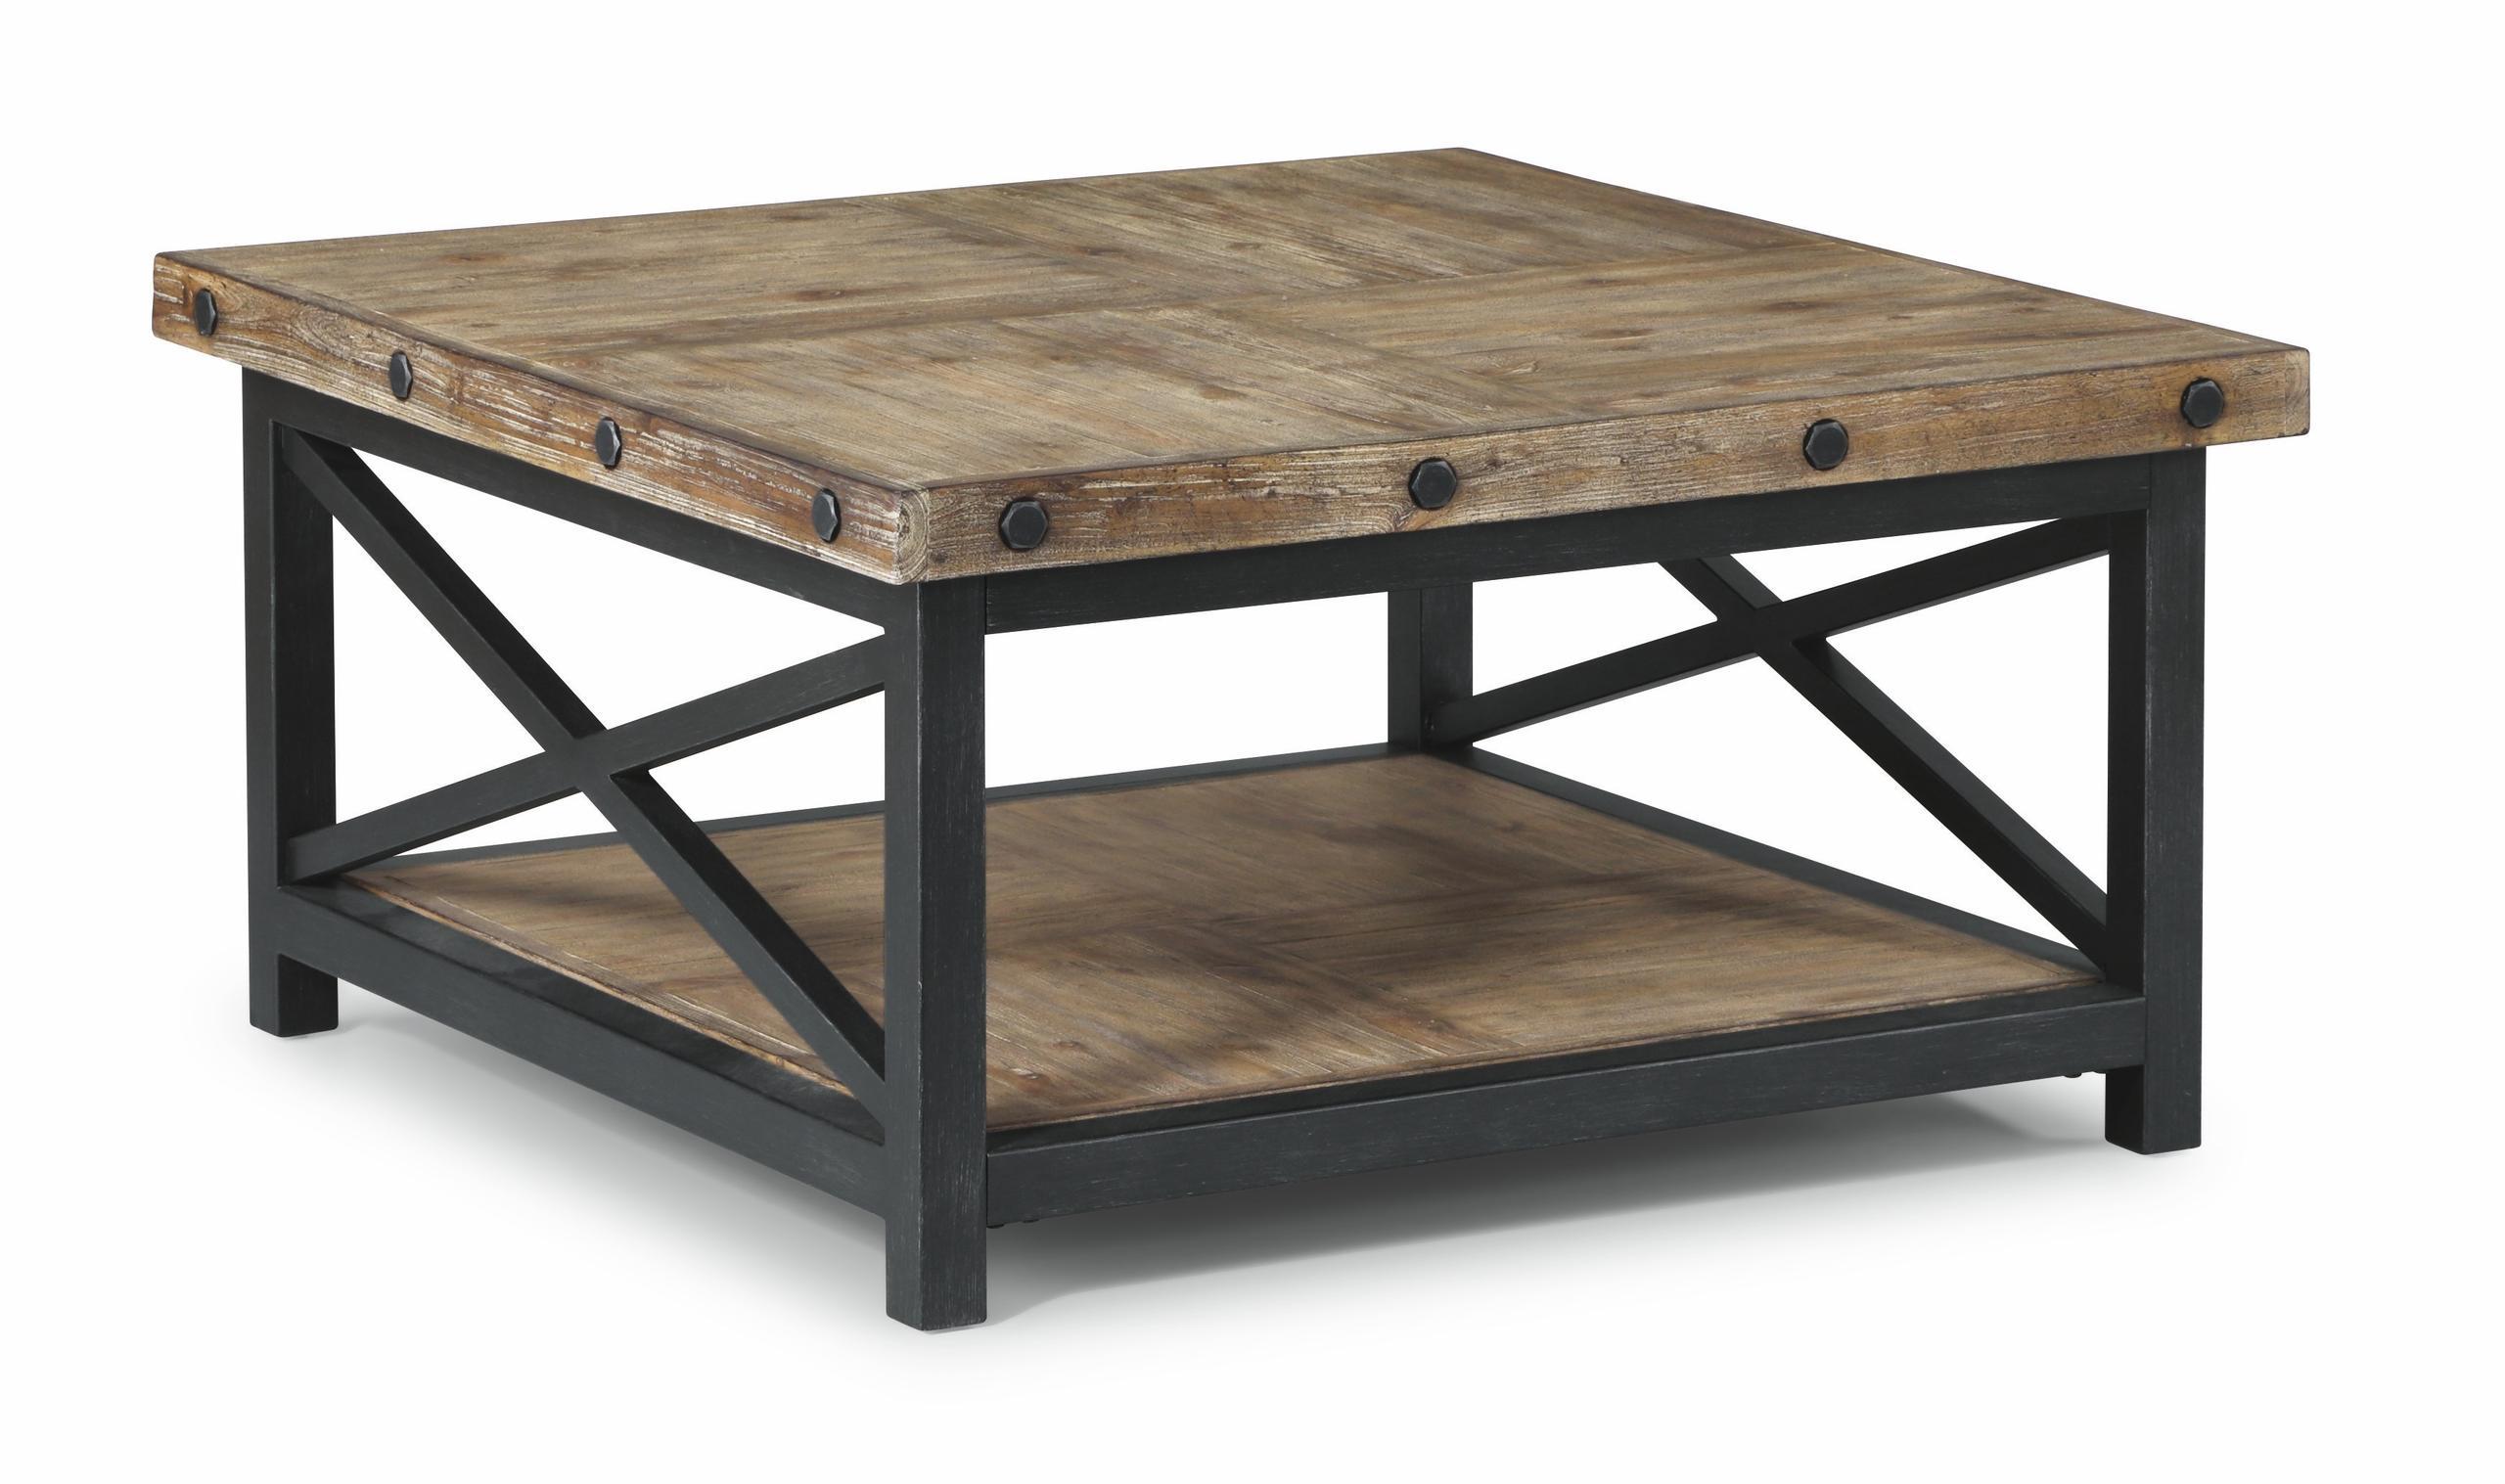 FlexsteelCarpenter Square Coffee Table